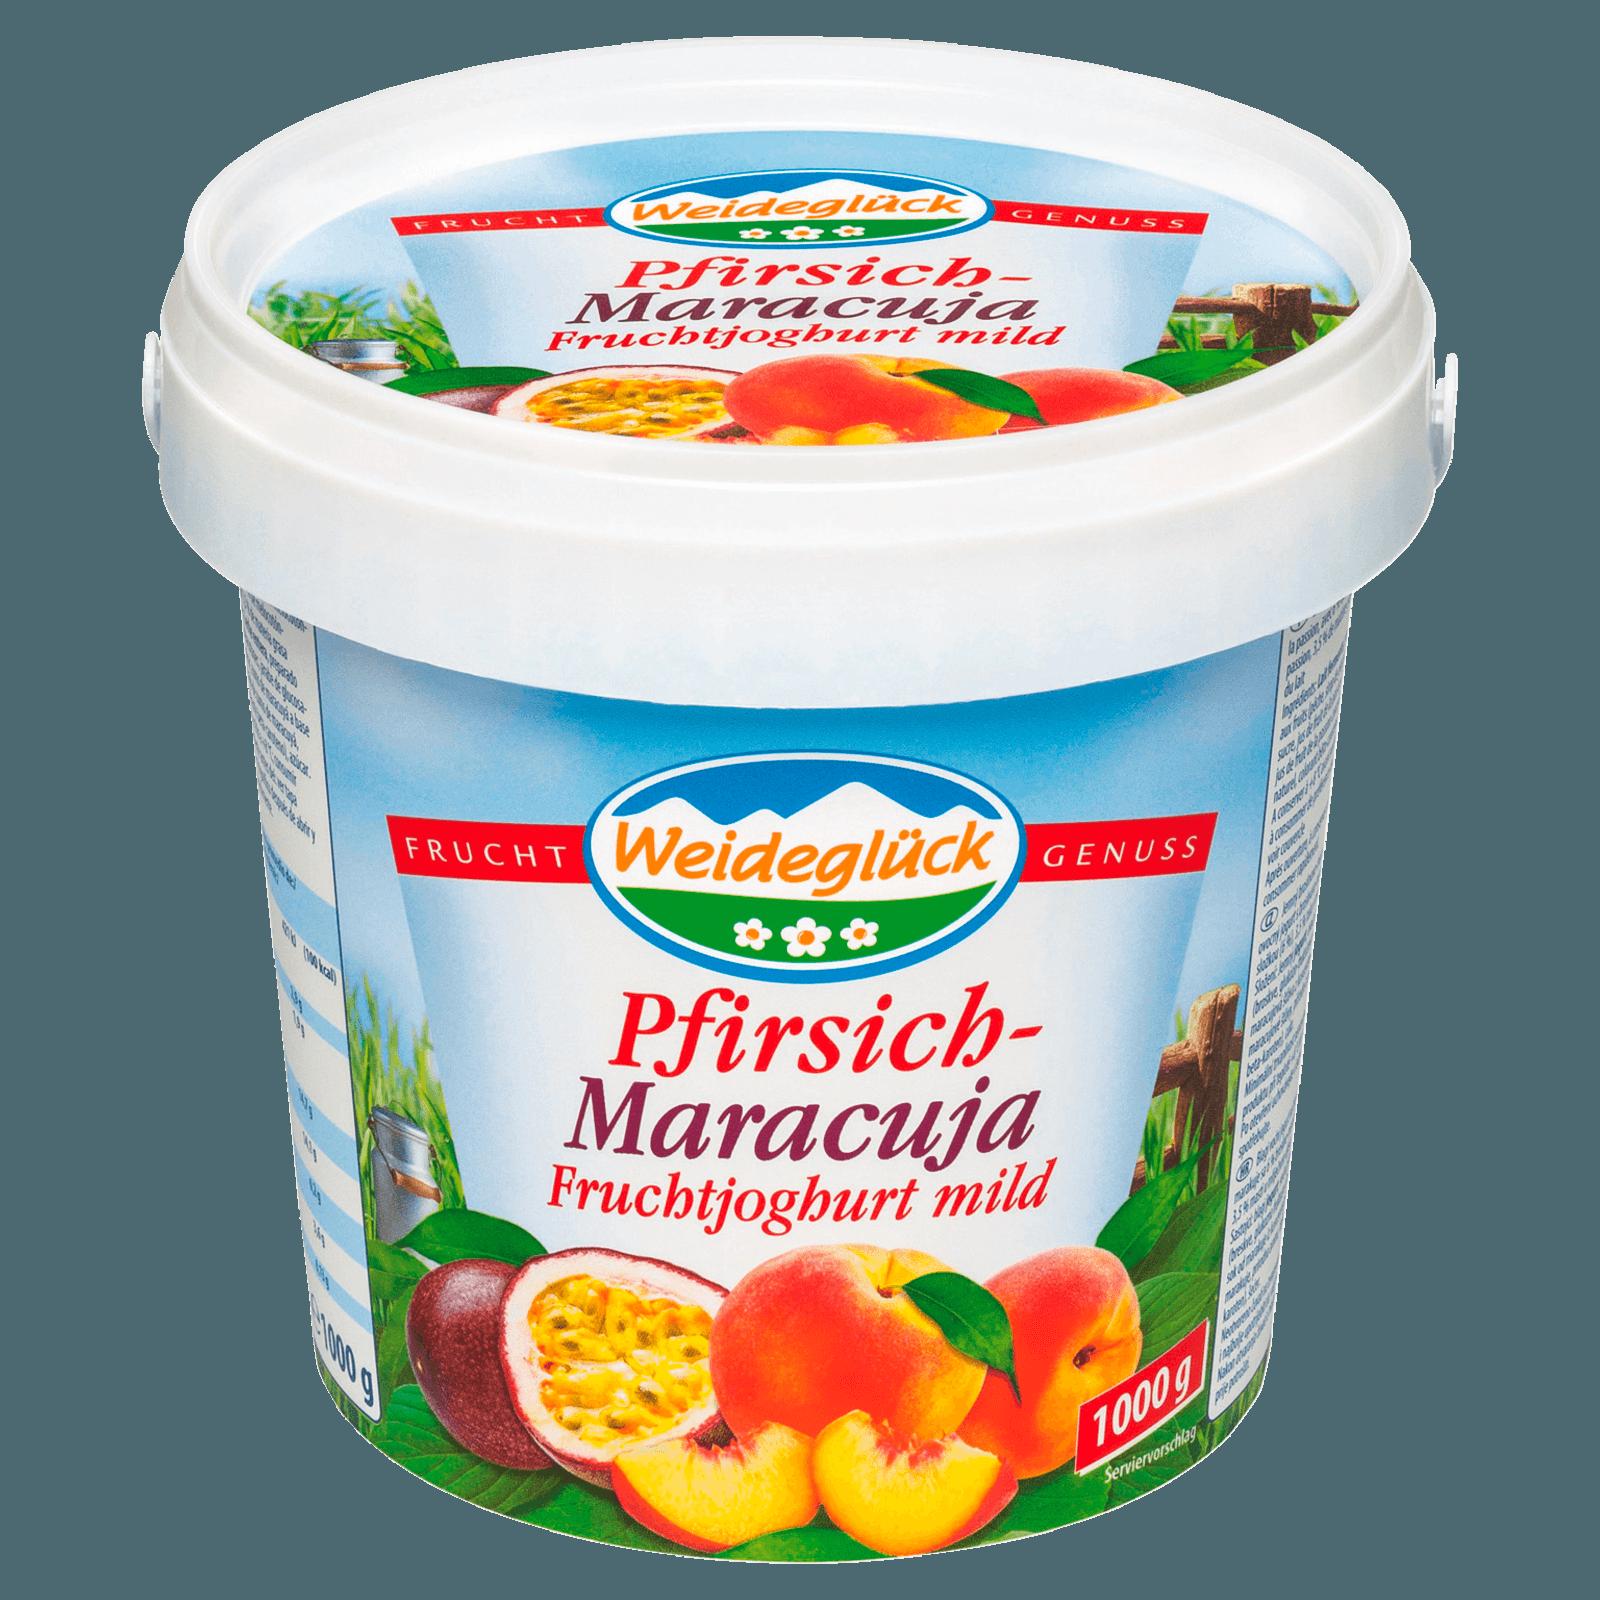 Weideglück Fruchtjoghurt Pfirsich-Maracuja 1kg